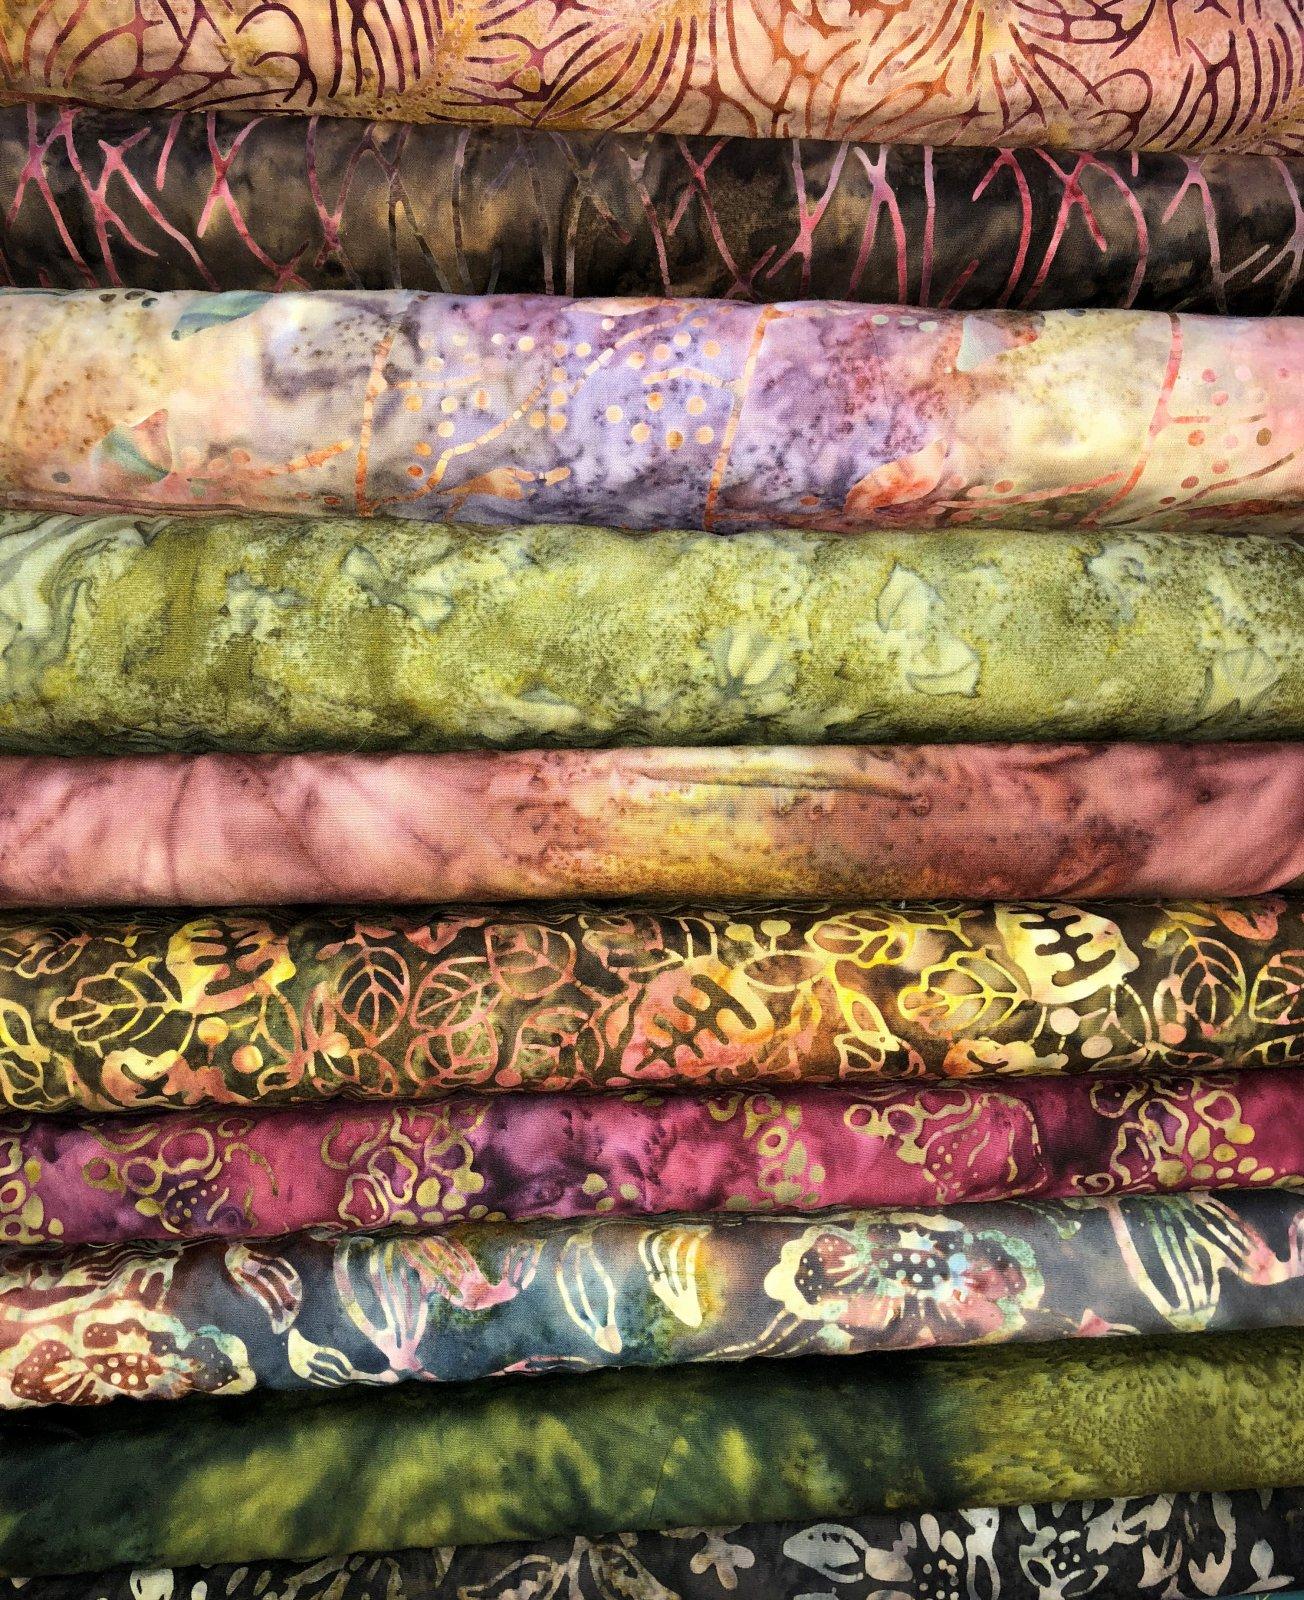 Earth-tones batik bundle